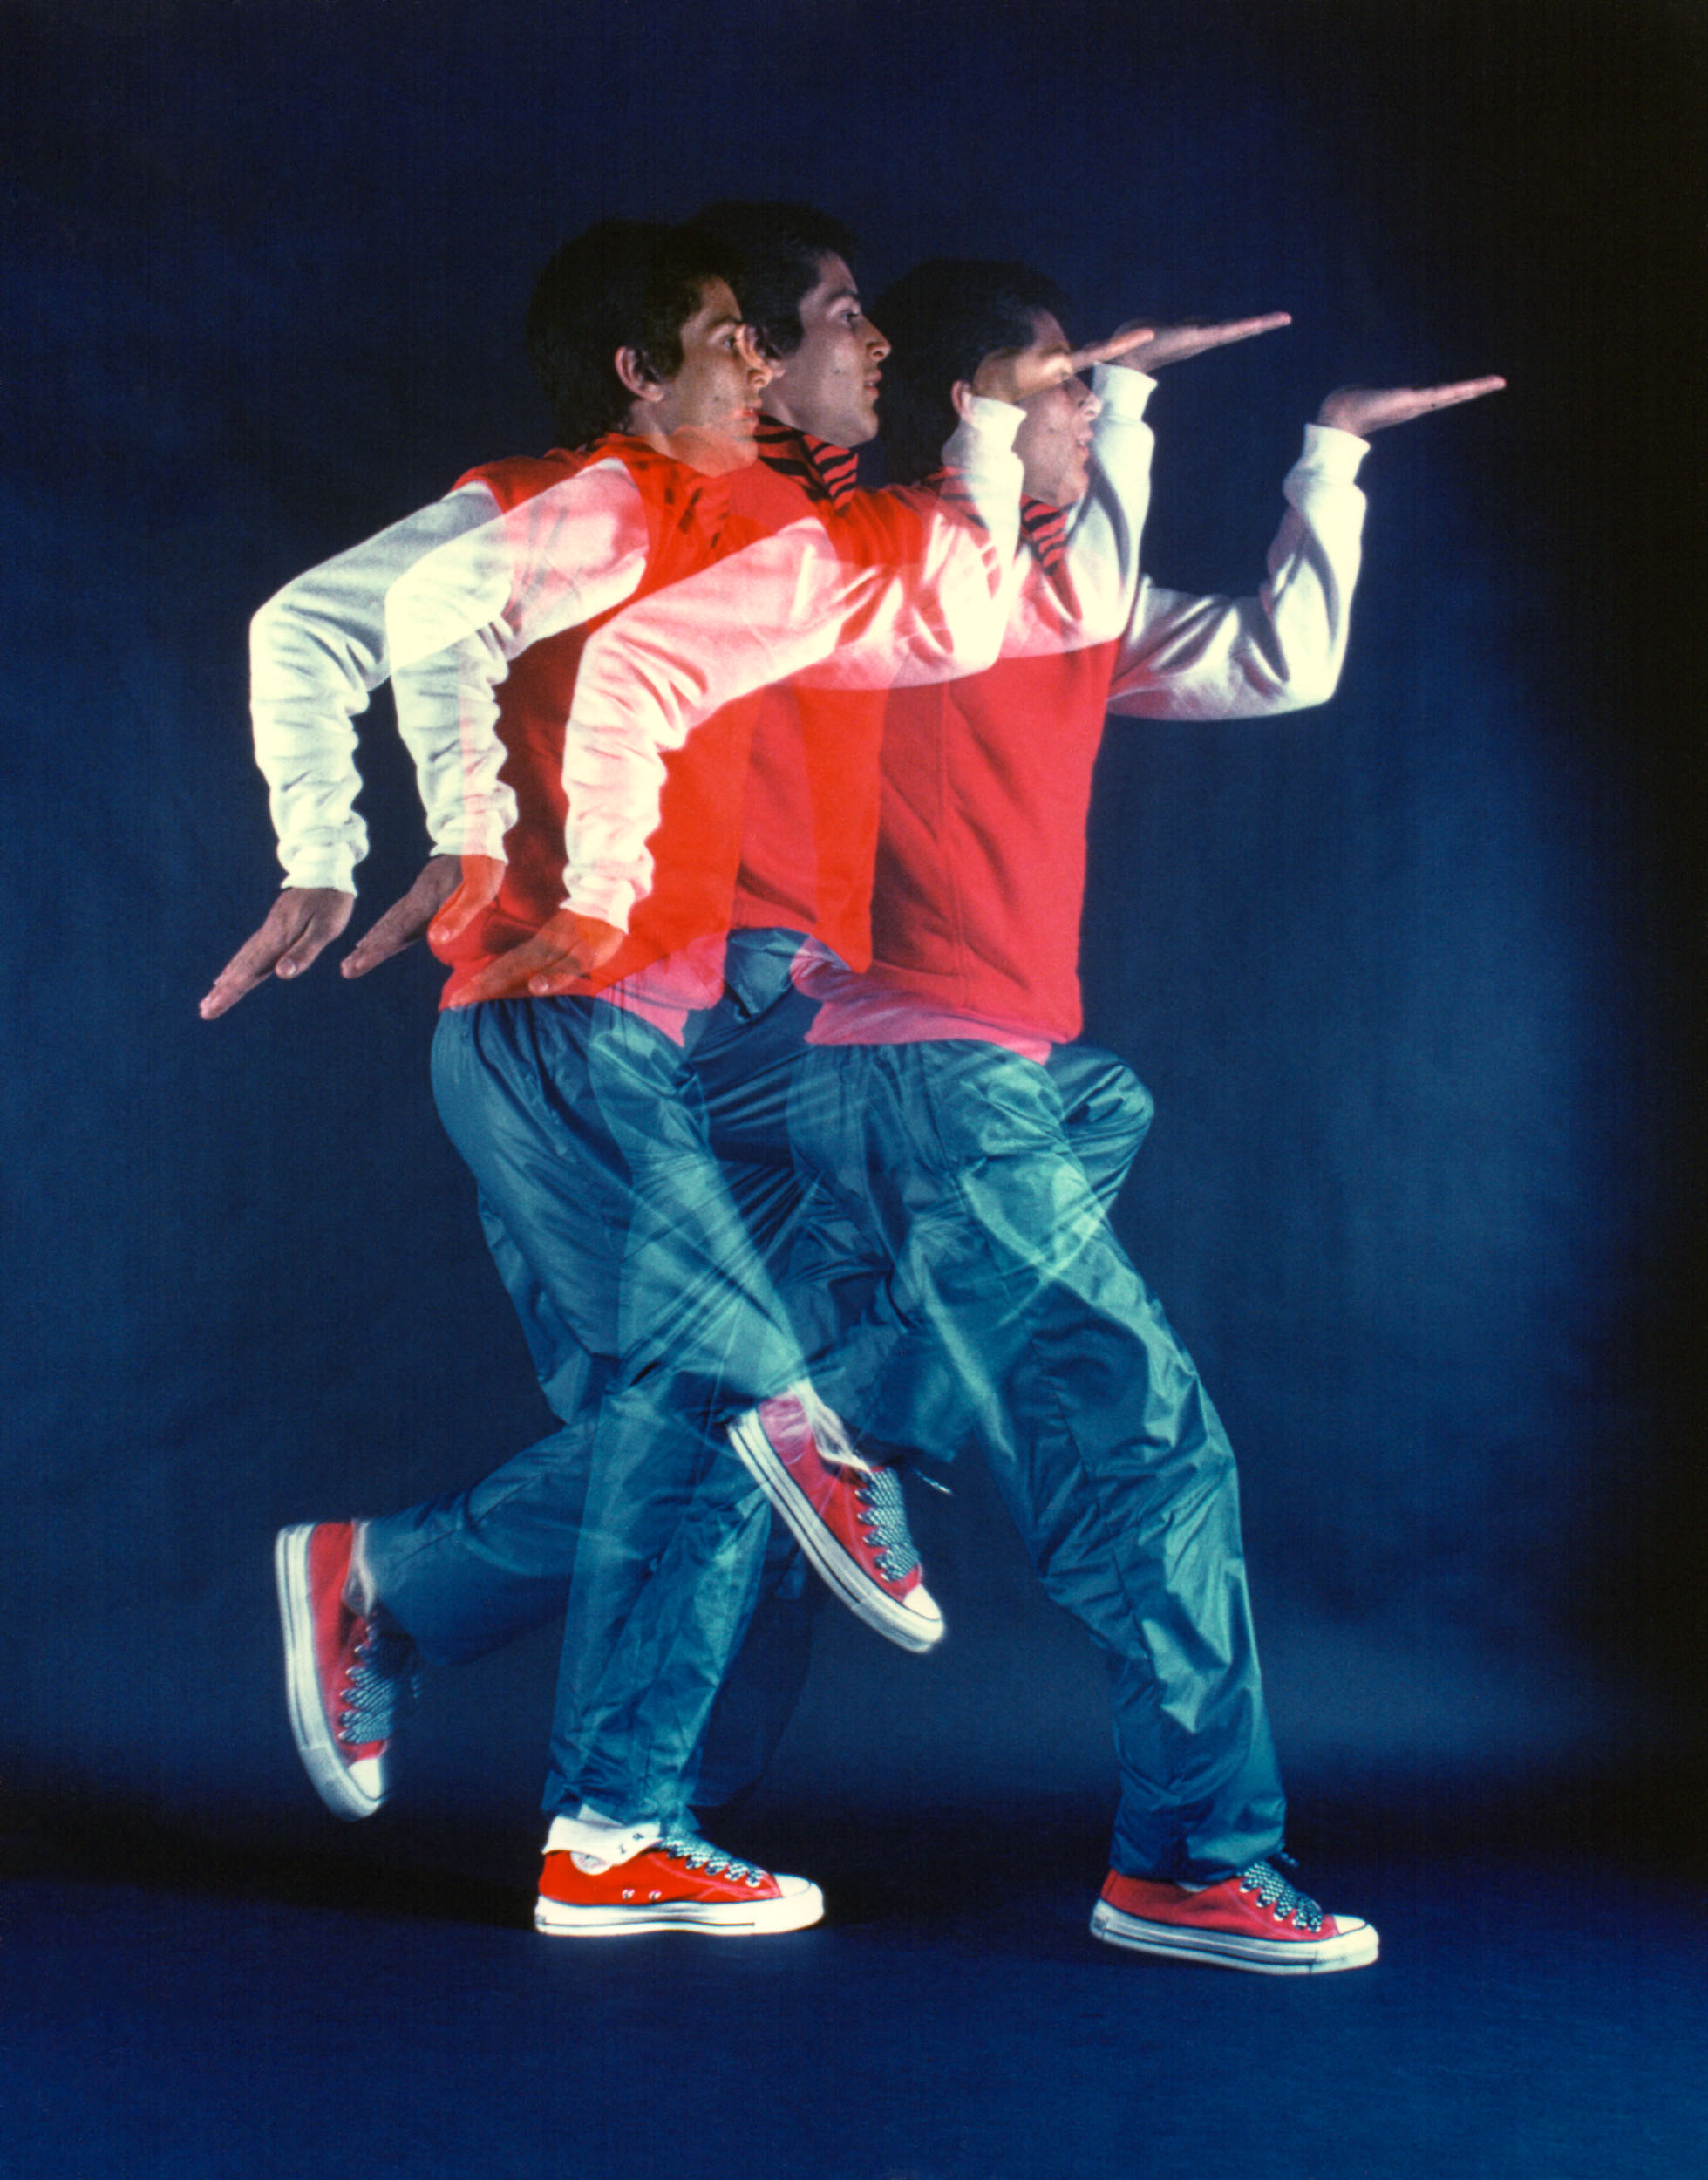 Siede-Preis-Photography-Breakdance.jpg